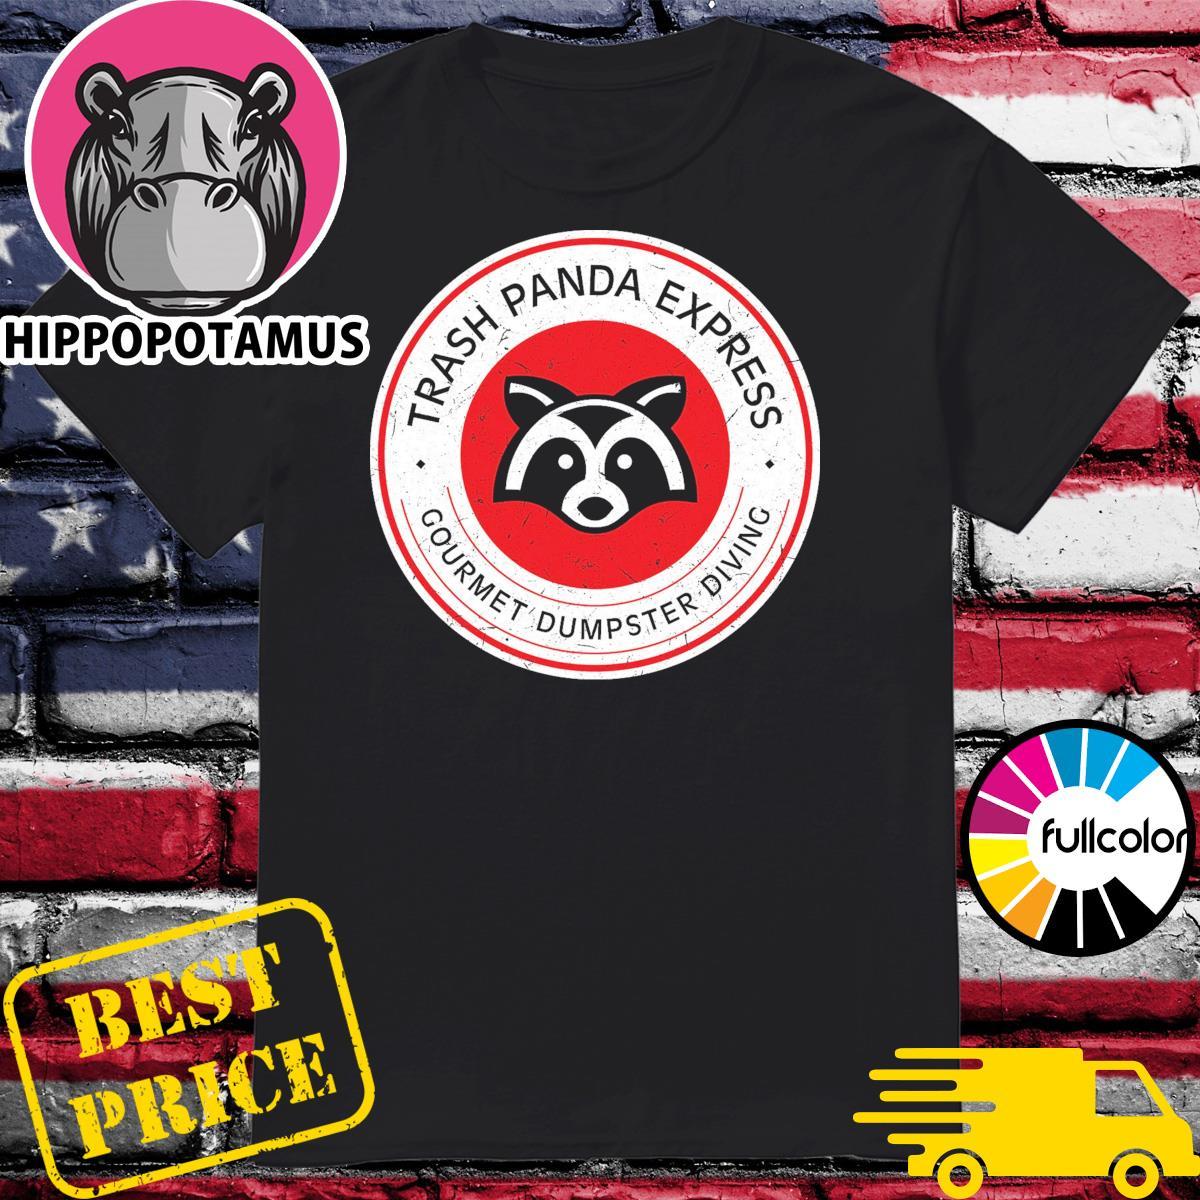 Trash Panda express gourmet dumpster diving shirt